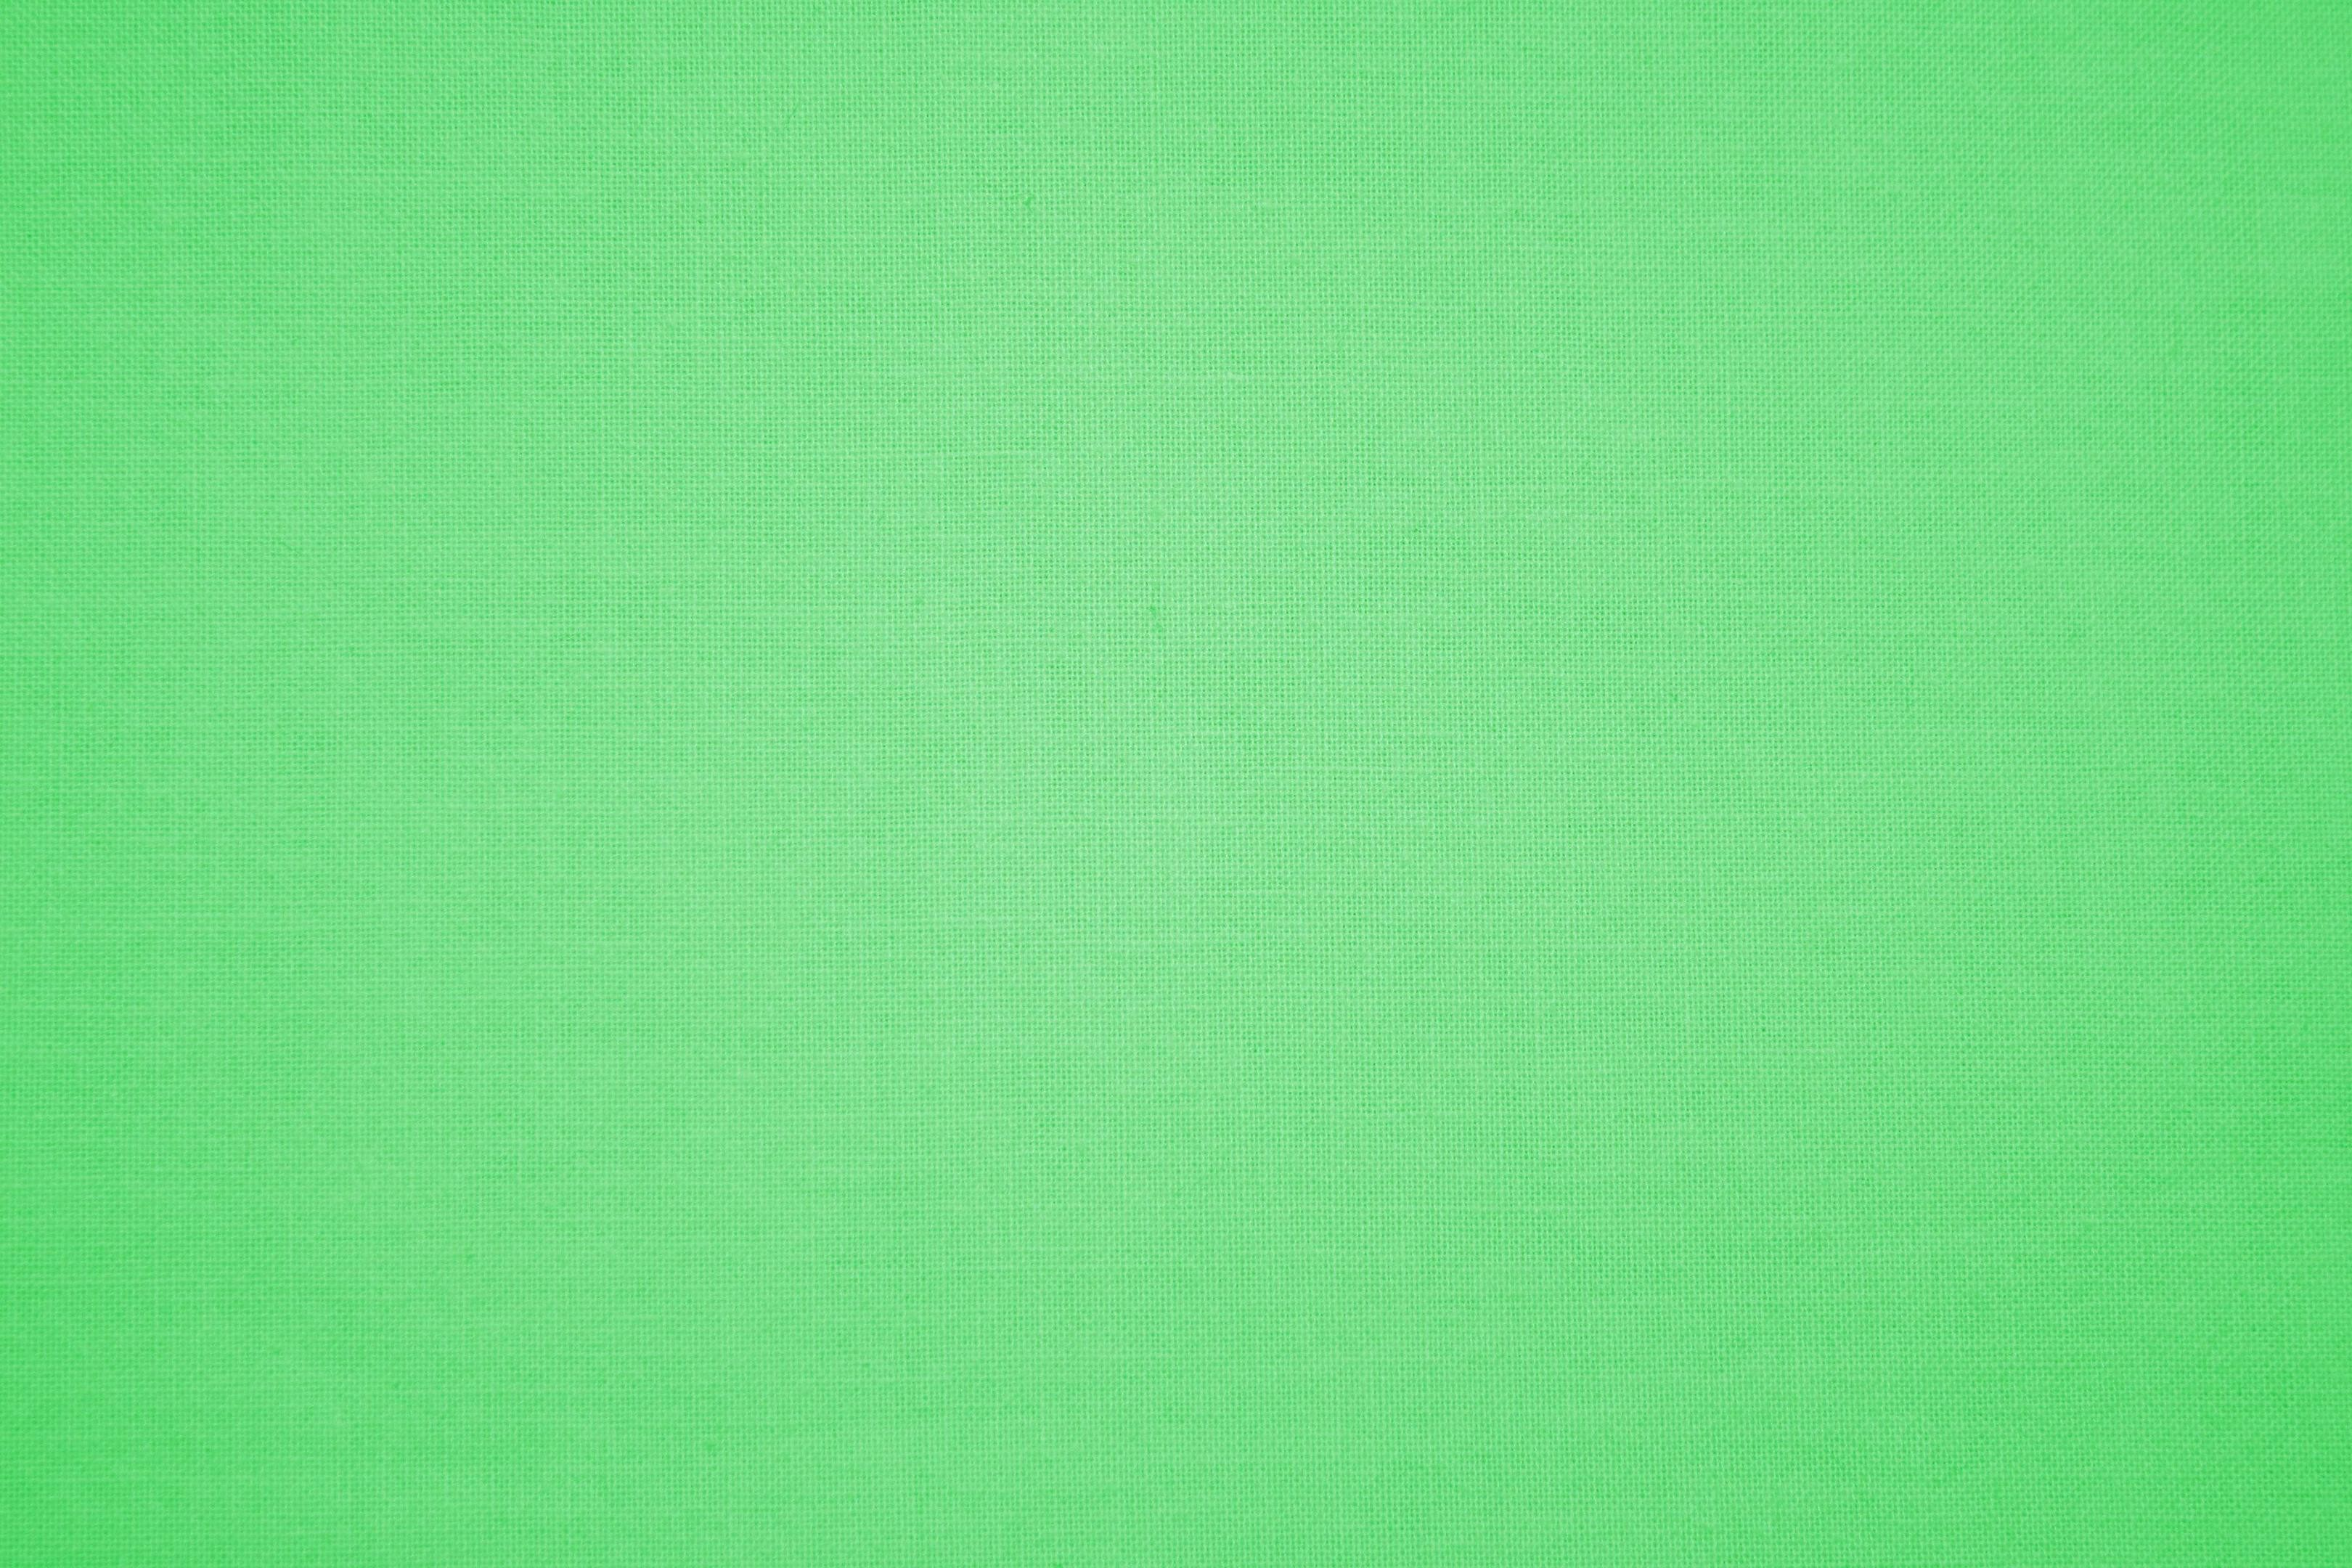 Light Green Wallpaper Desktop 23994 HD Pictures | Top Background Free